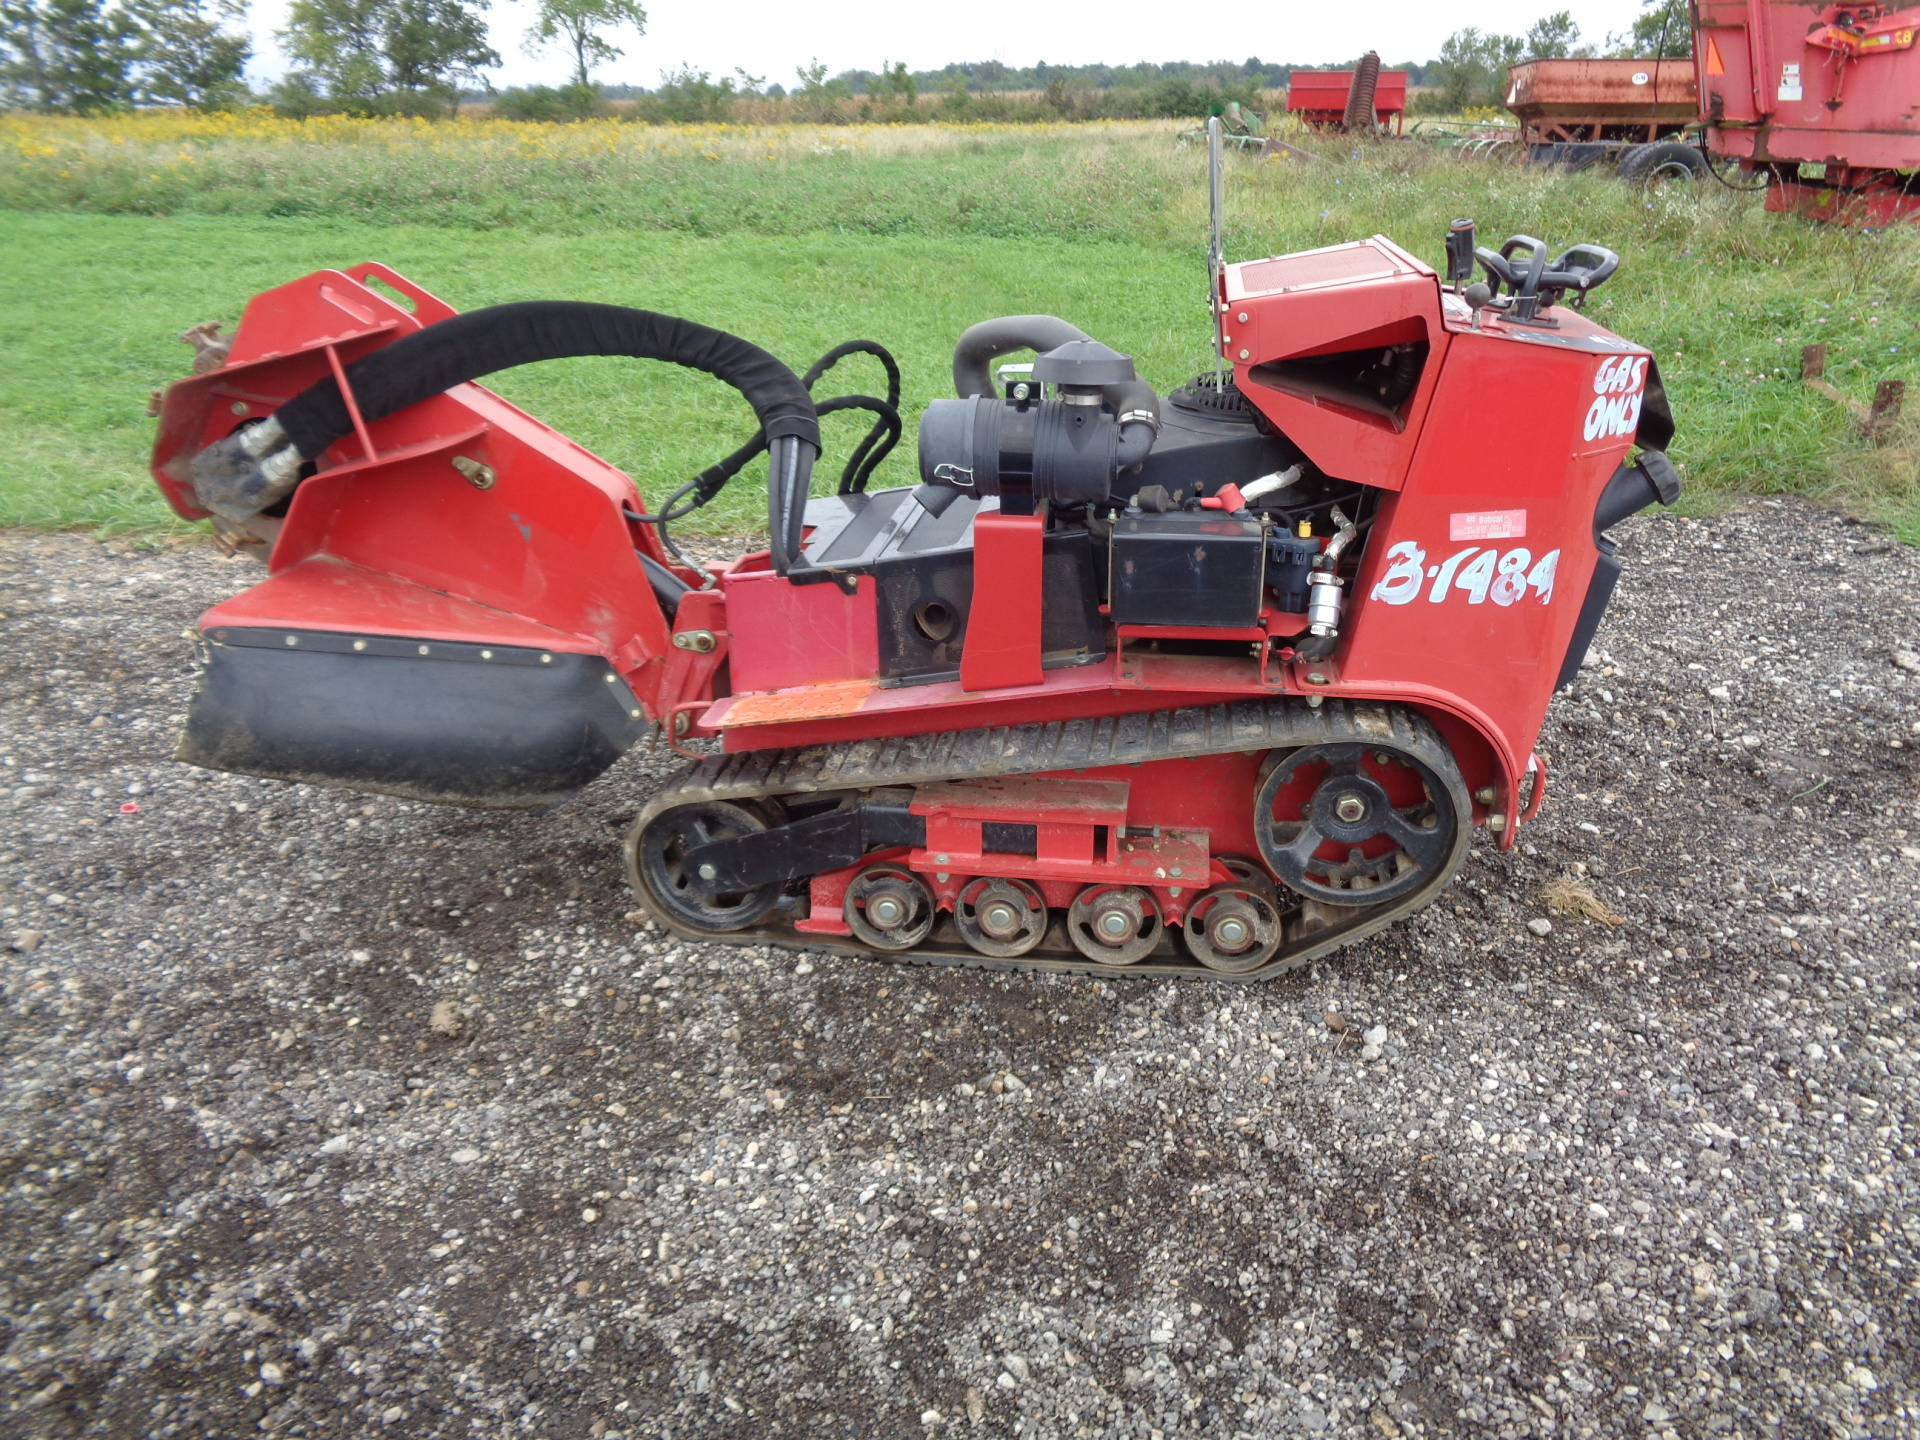 2013 Toro STX38     $14,900